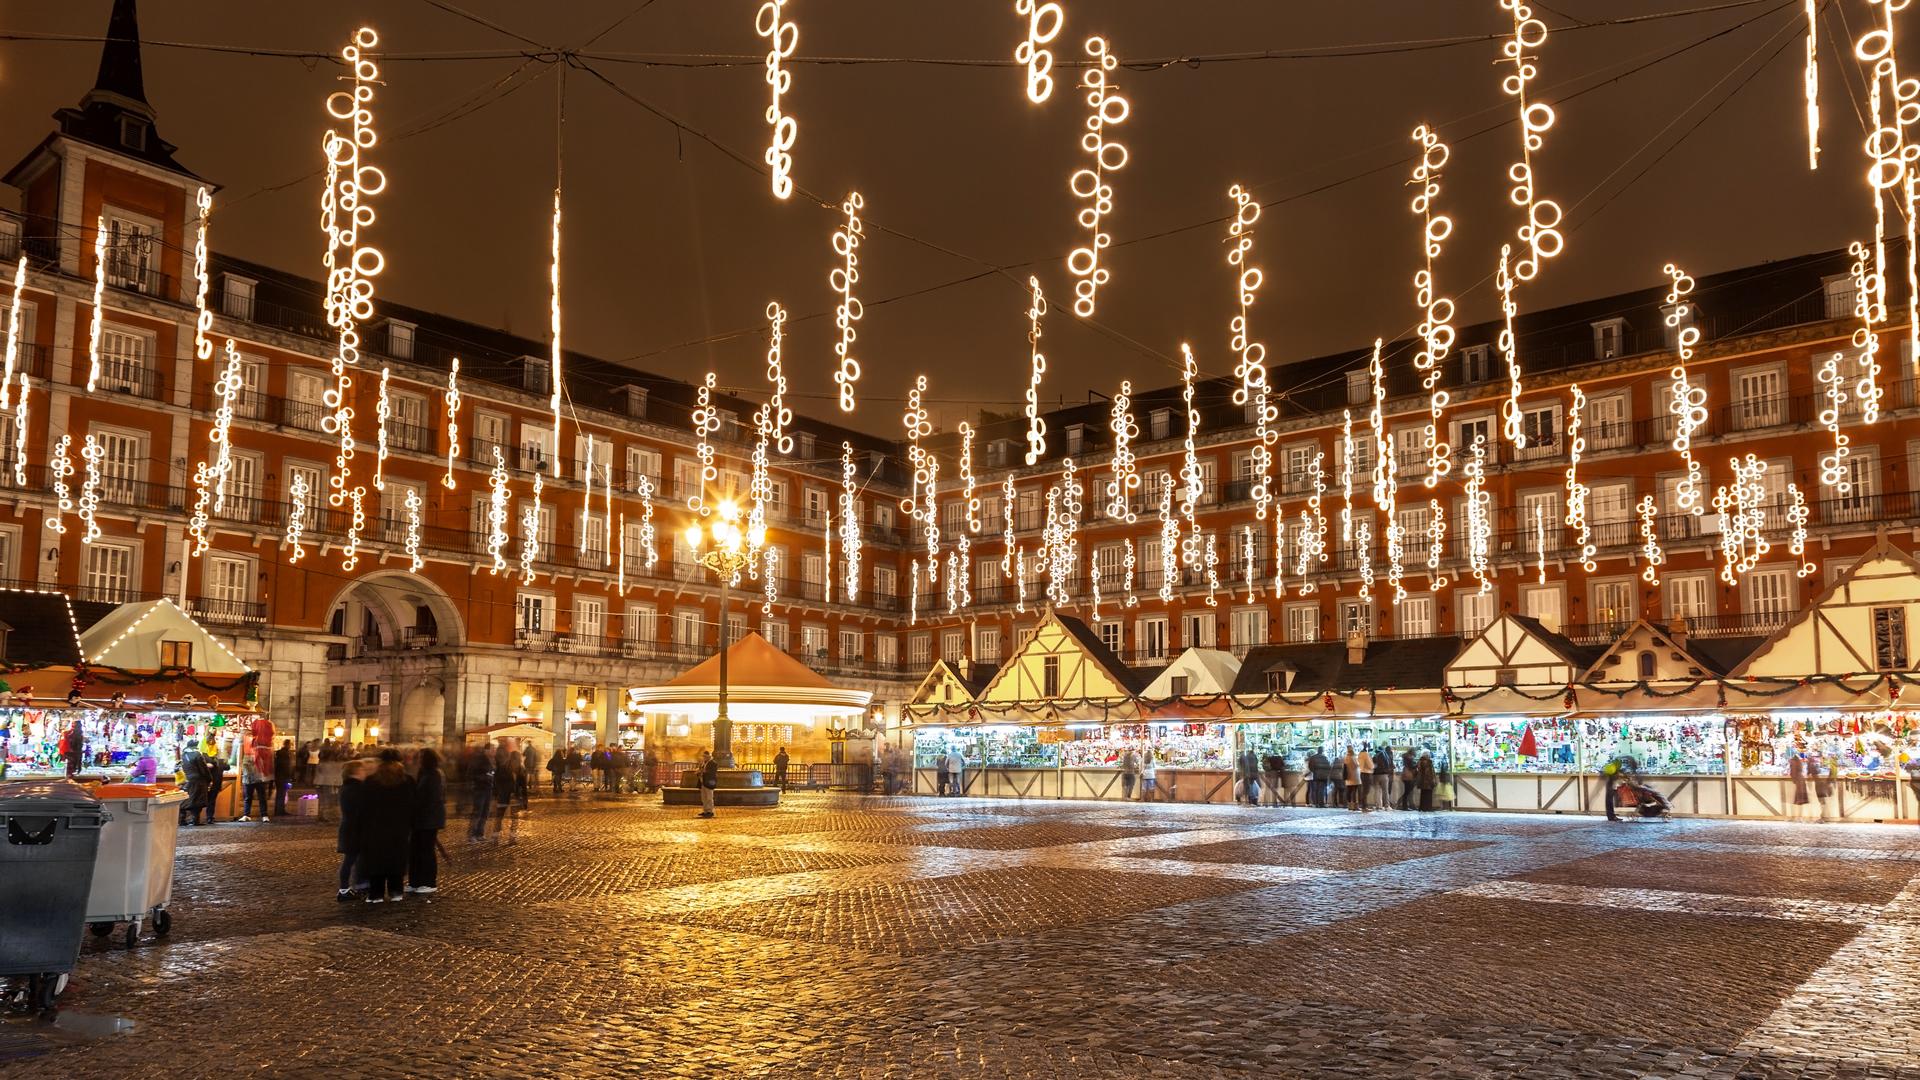 Navidad 2020 en Madrid - noticias navideñas